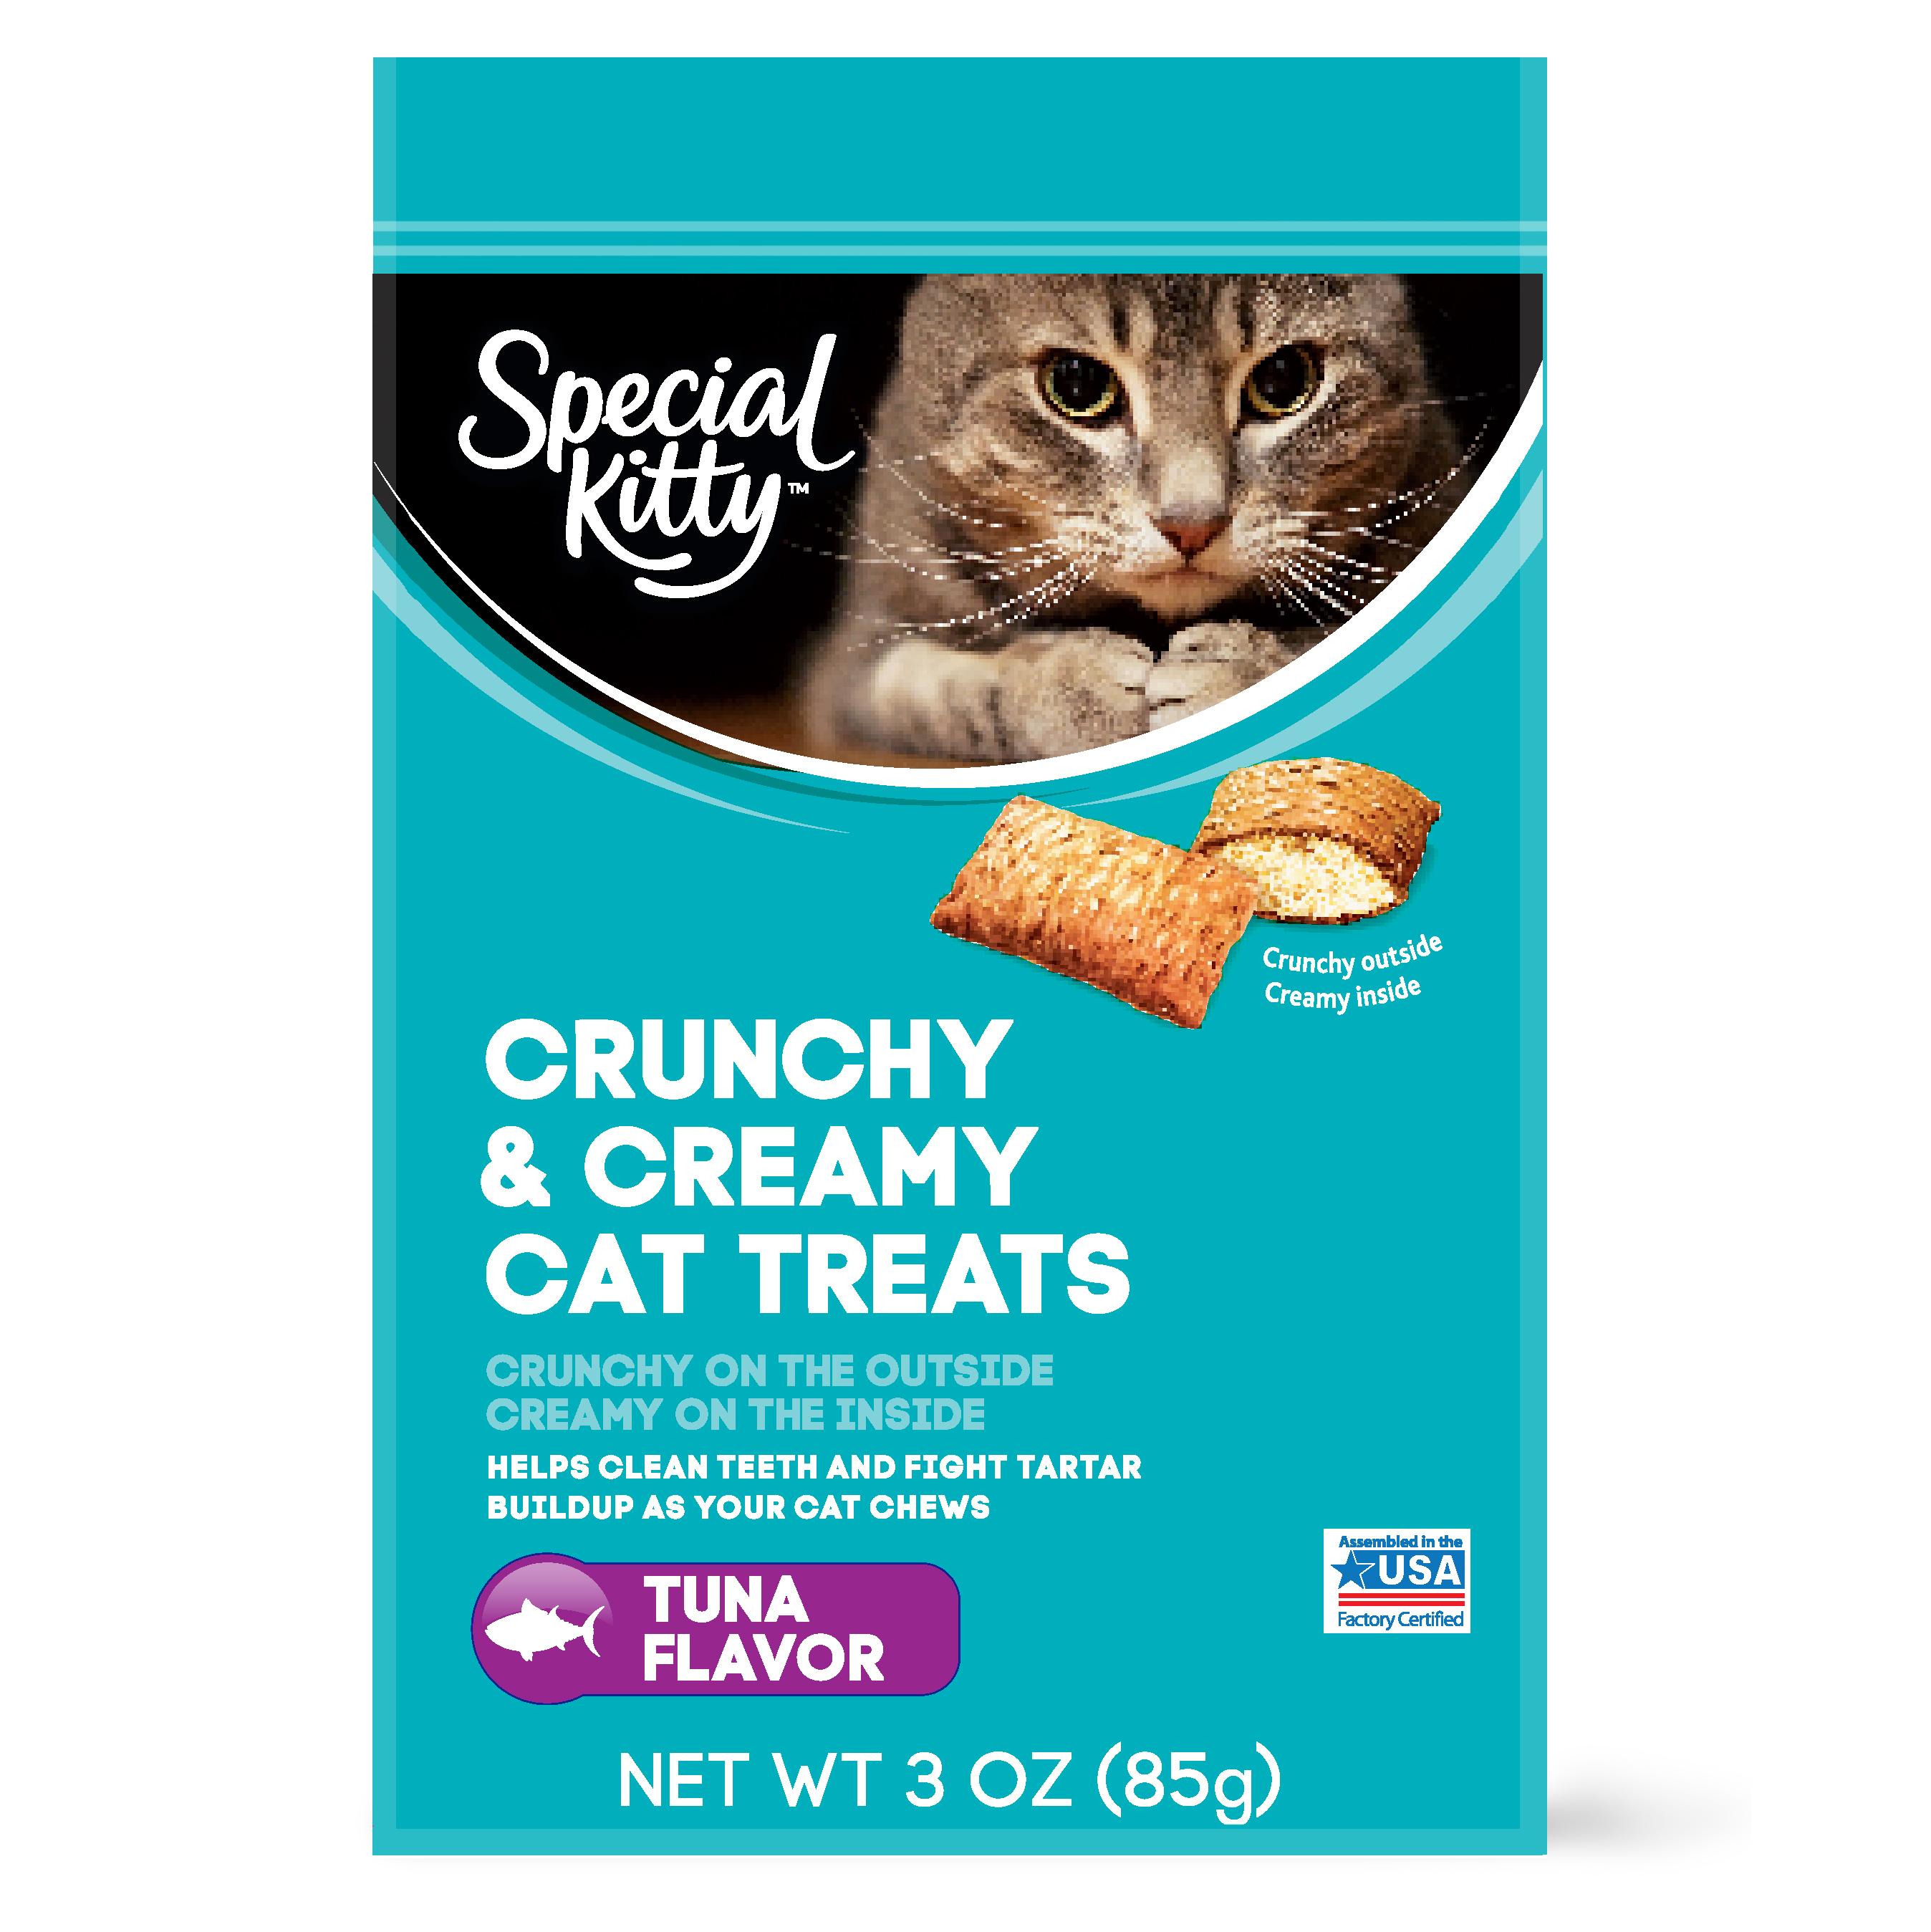 (6 pack) Special Kitty Crunchy & Creamy Cat Treats, Tuna Flavor, 3 Oz